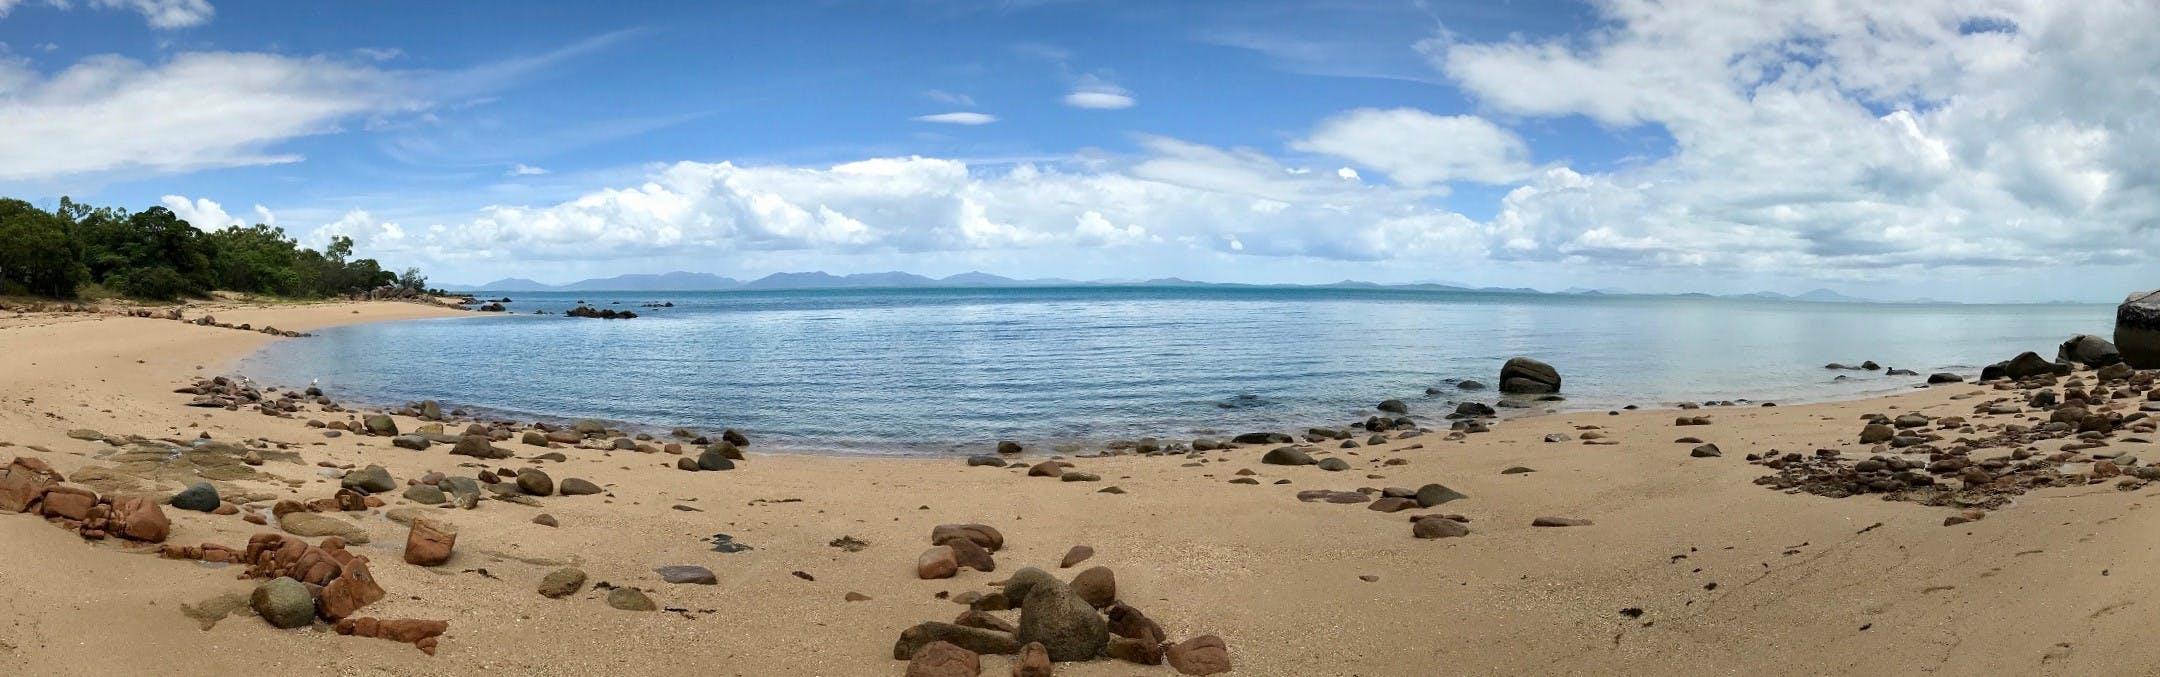 Panorama - Frog Rock beach.jpg